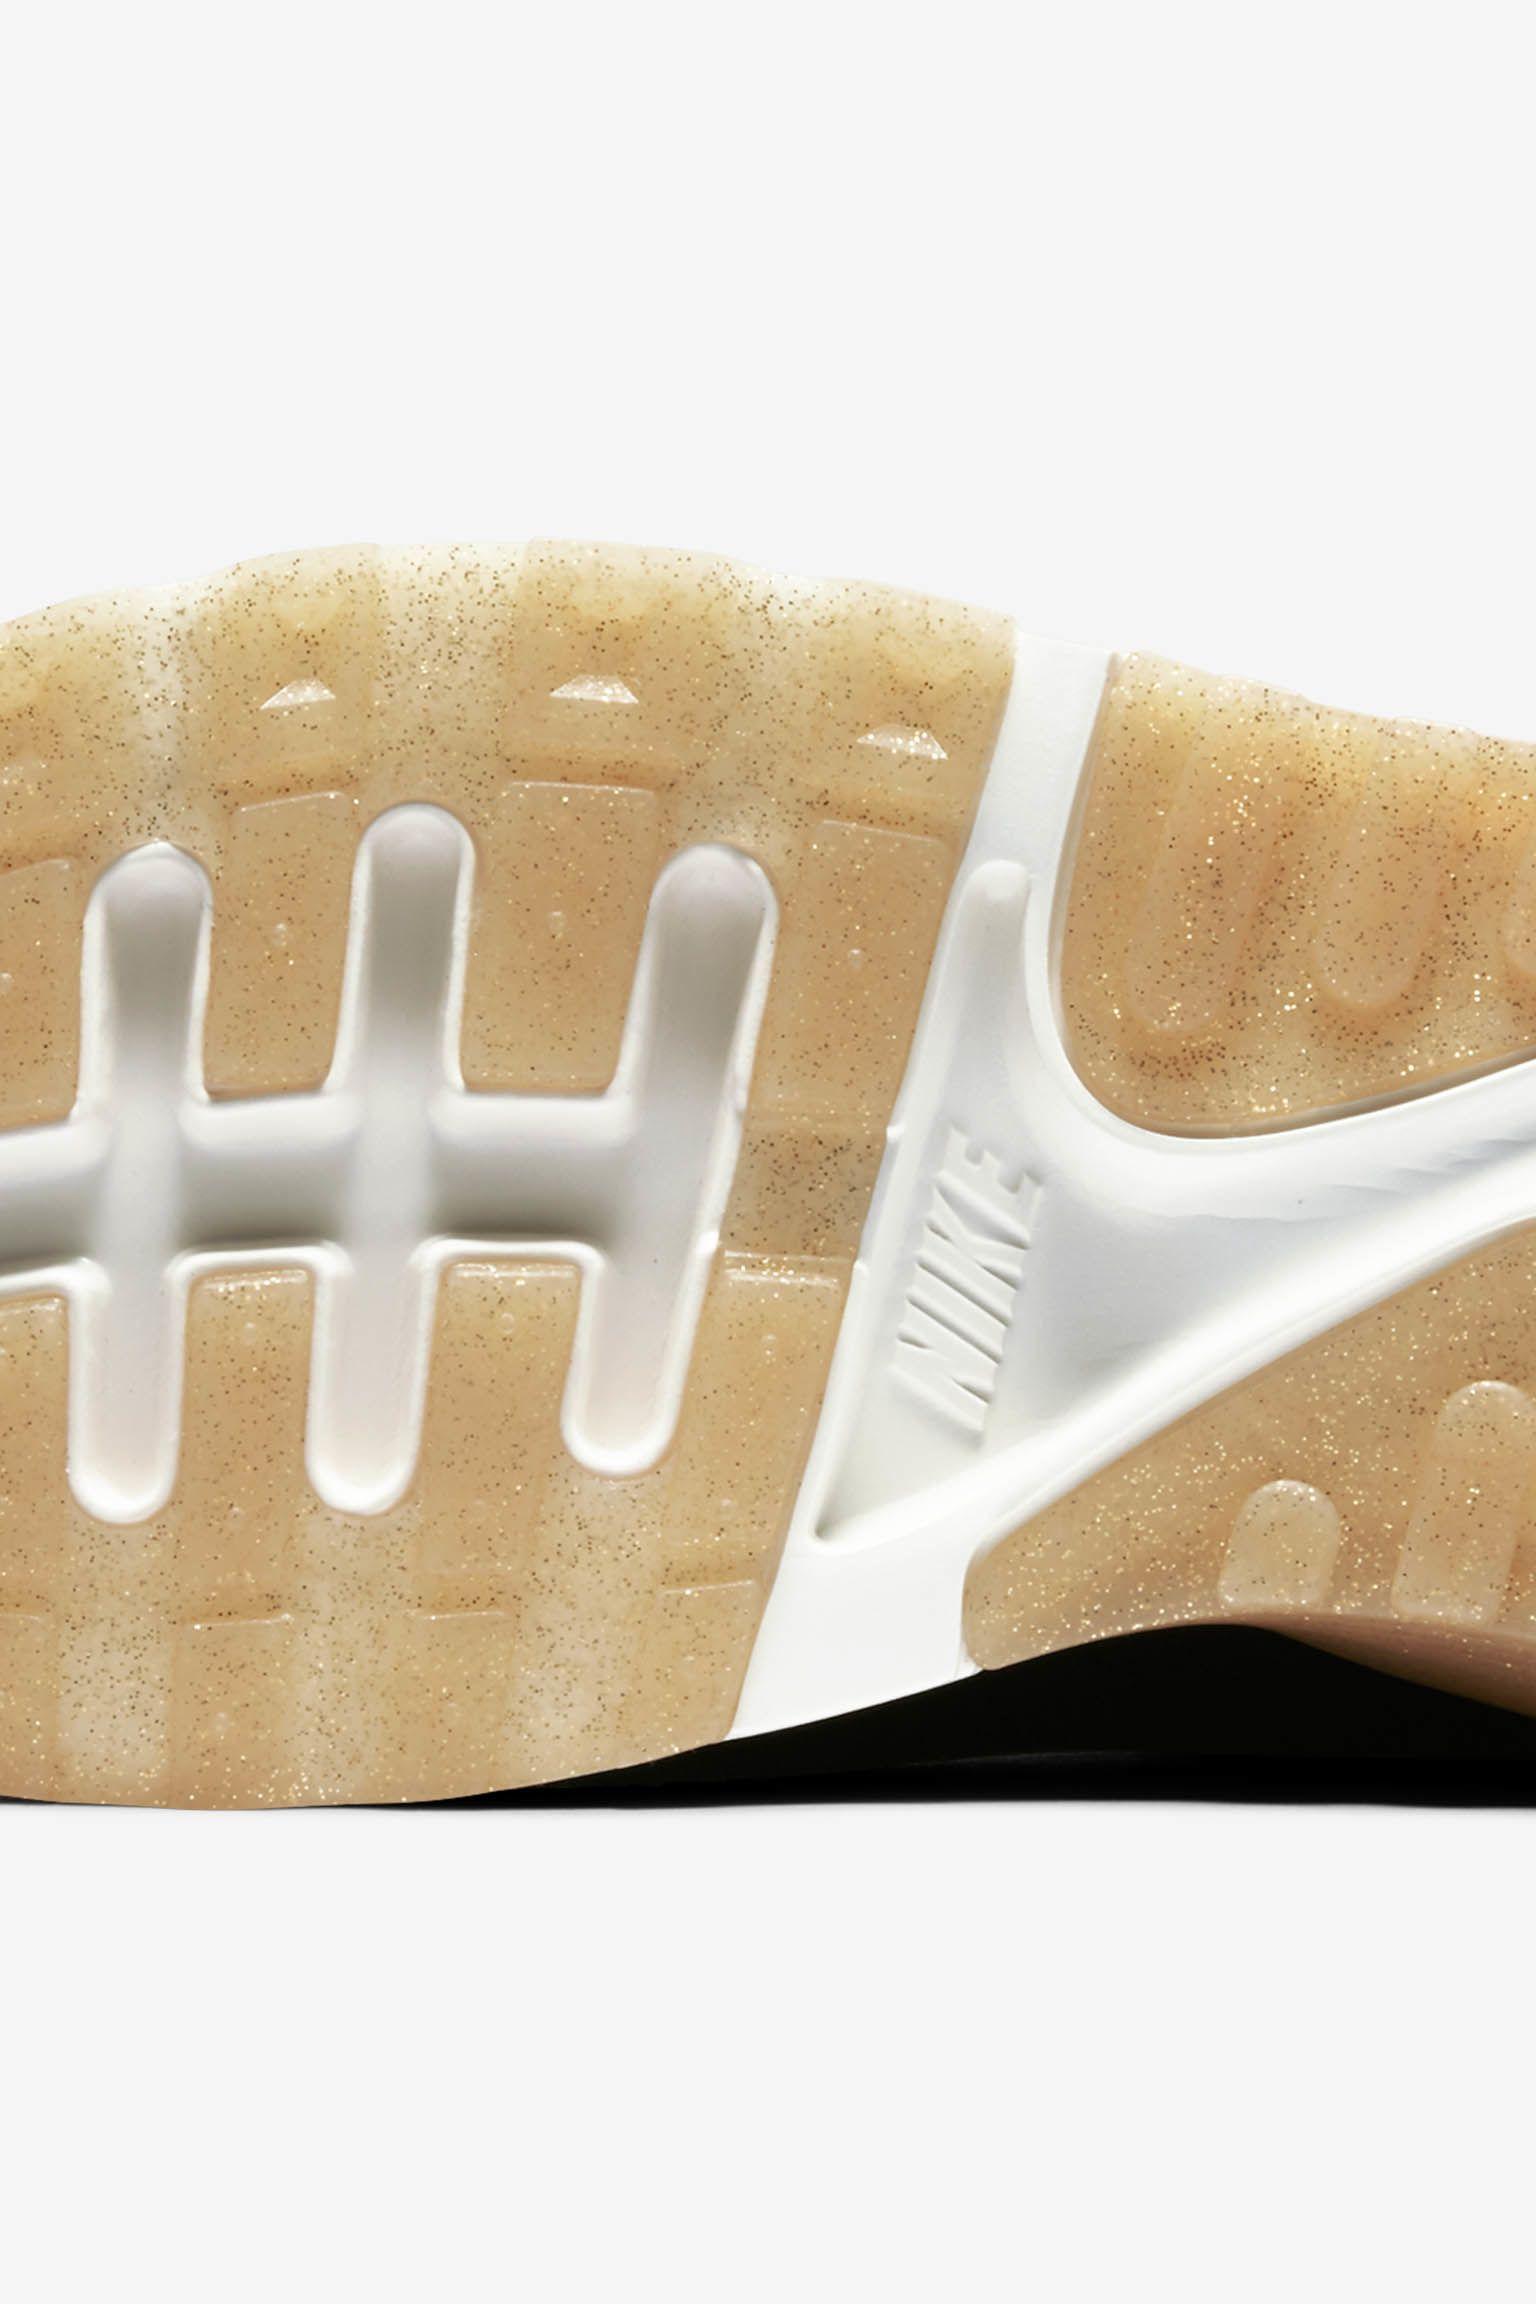 "Nike Air Max 90 Ultra 2.0 Flyknit Metallic ""Black & Metallic Gold"" - Donna"